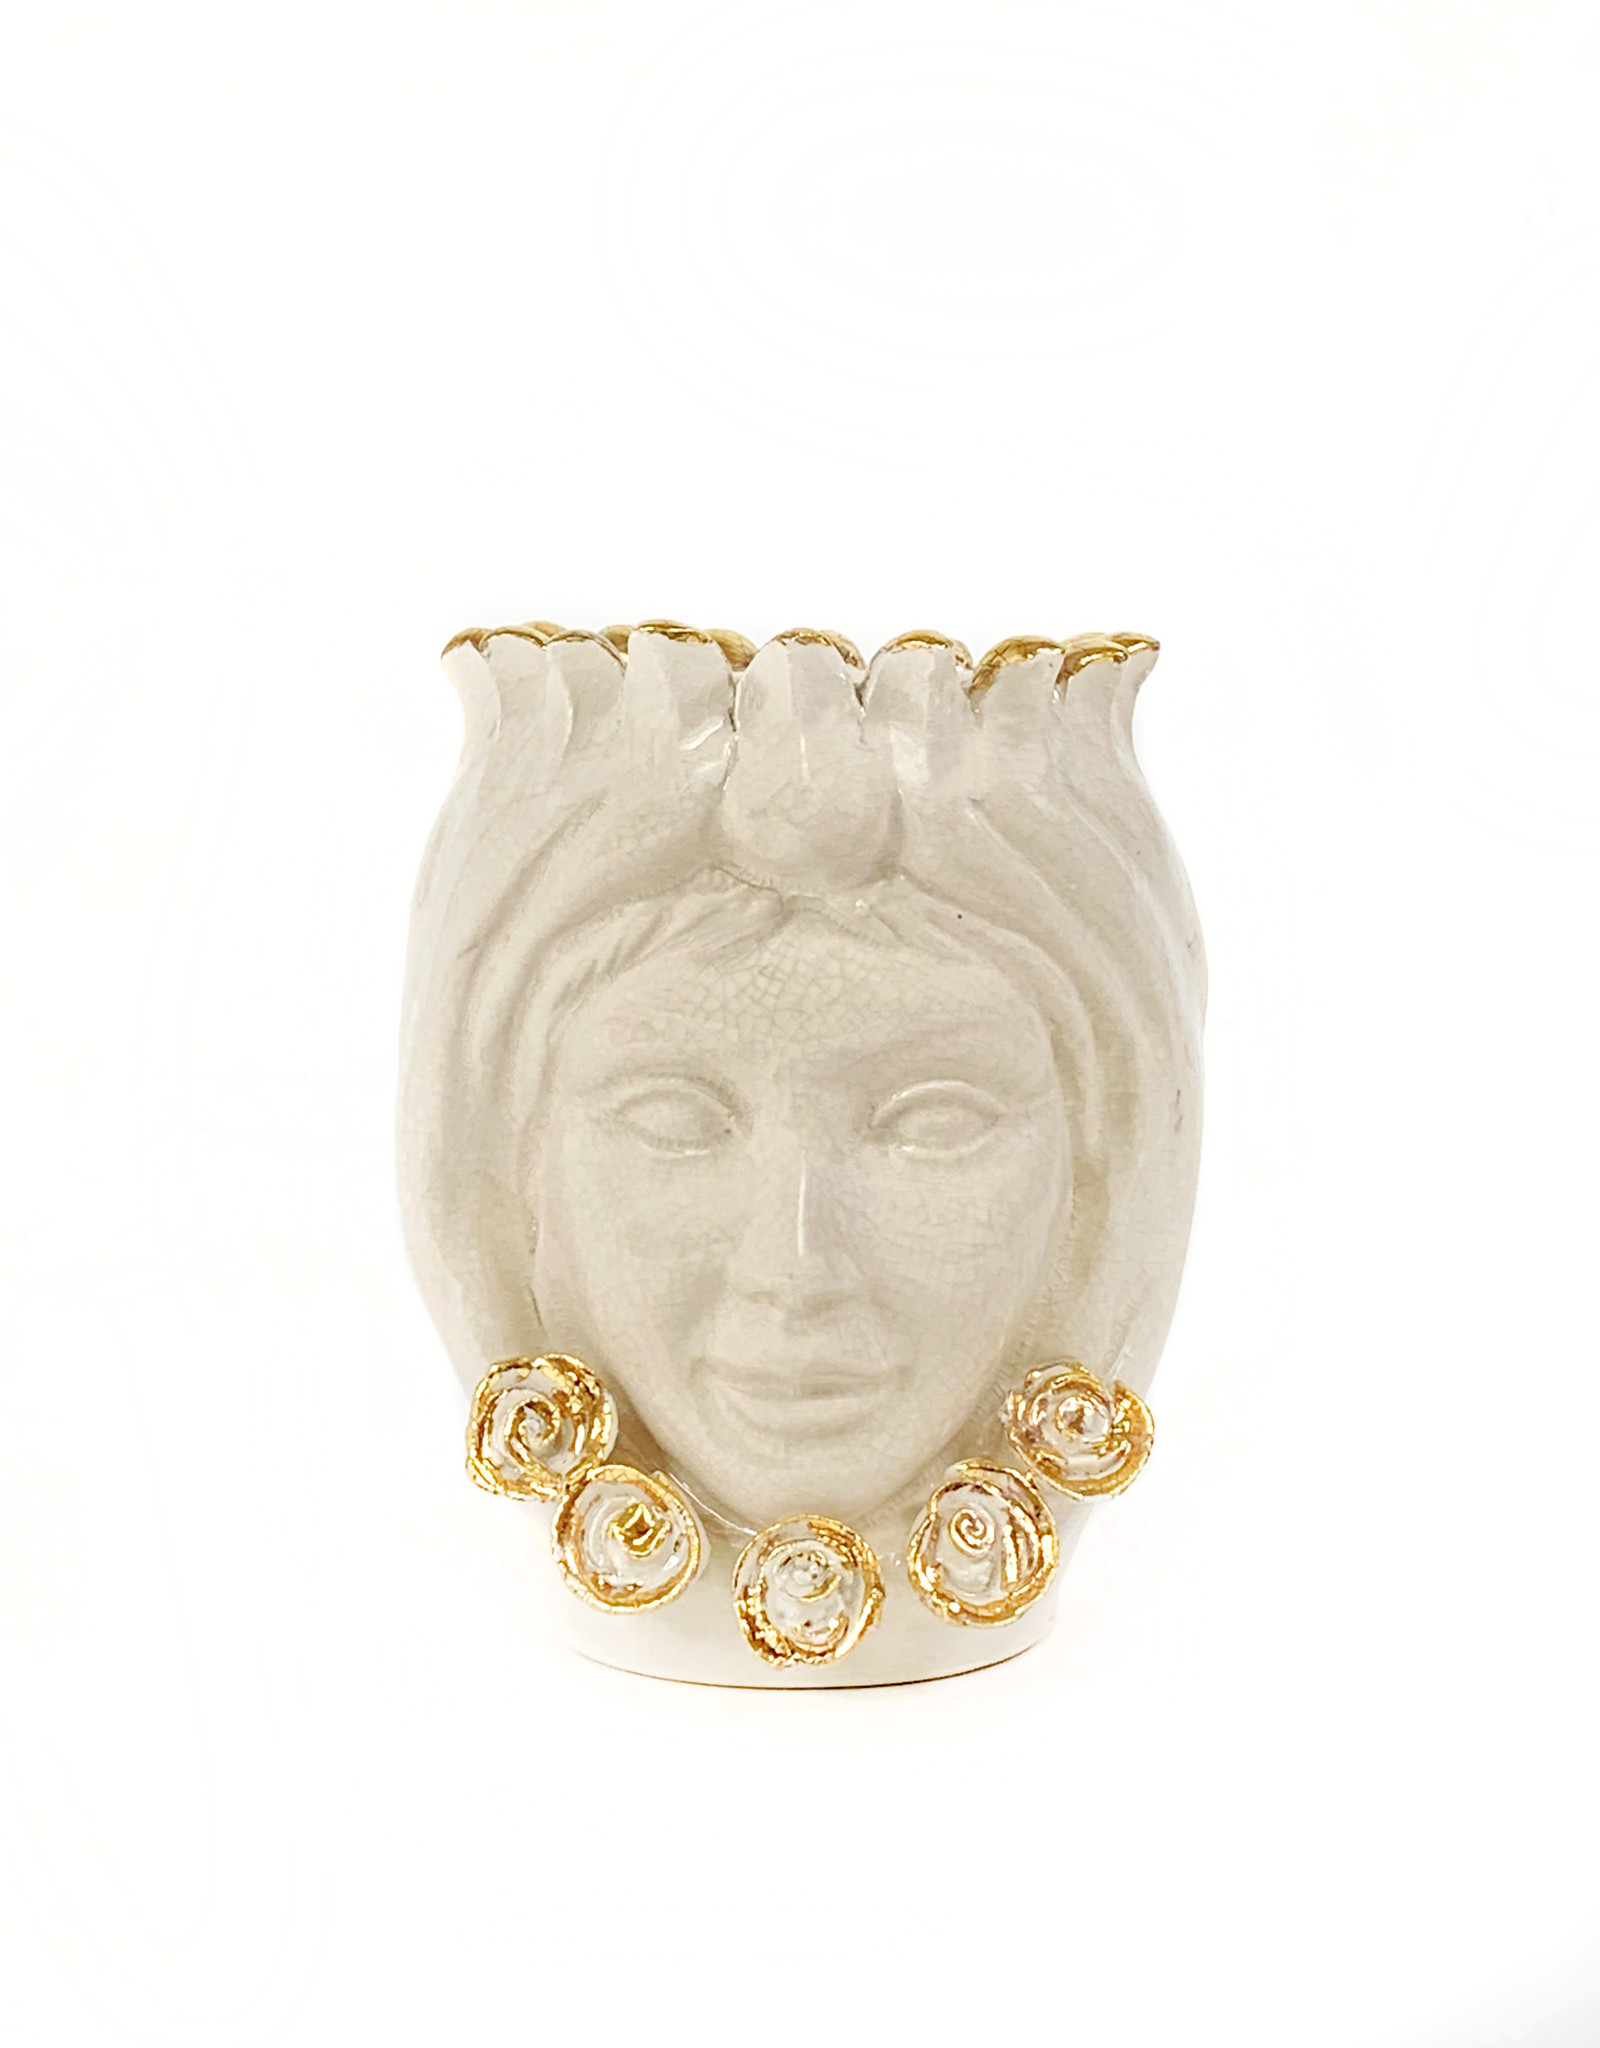 Agata Treasures Golden Nunzia cream with gold head vase